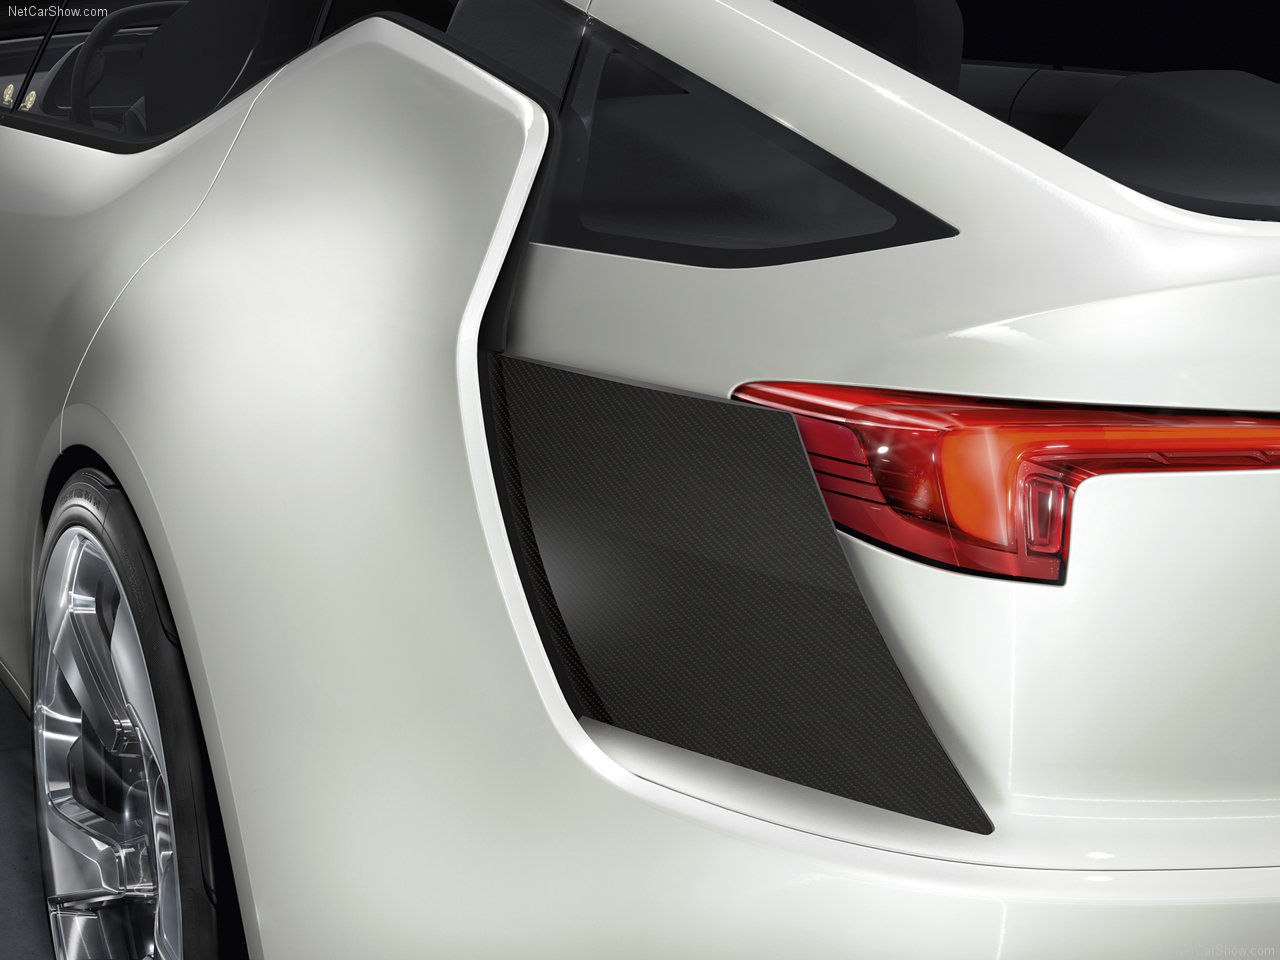 http://4.bp.blogspot.com/_lsyt_wQ2awY/TDtA-G0-RdI/AAAAAAAB-Bw/wfBc1Pgsy2k/s1600/Opel-Flextreme_GT-E_Concept_2010_1280x960_wallpaper_07.jpg